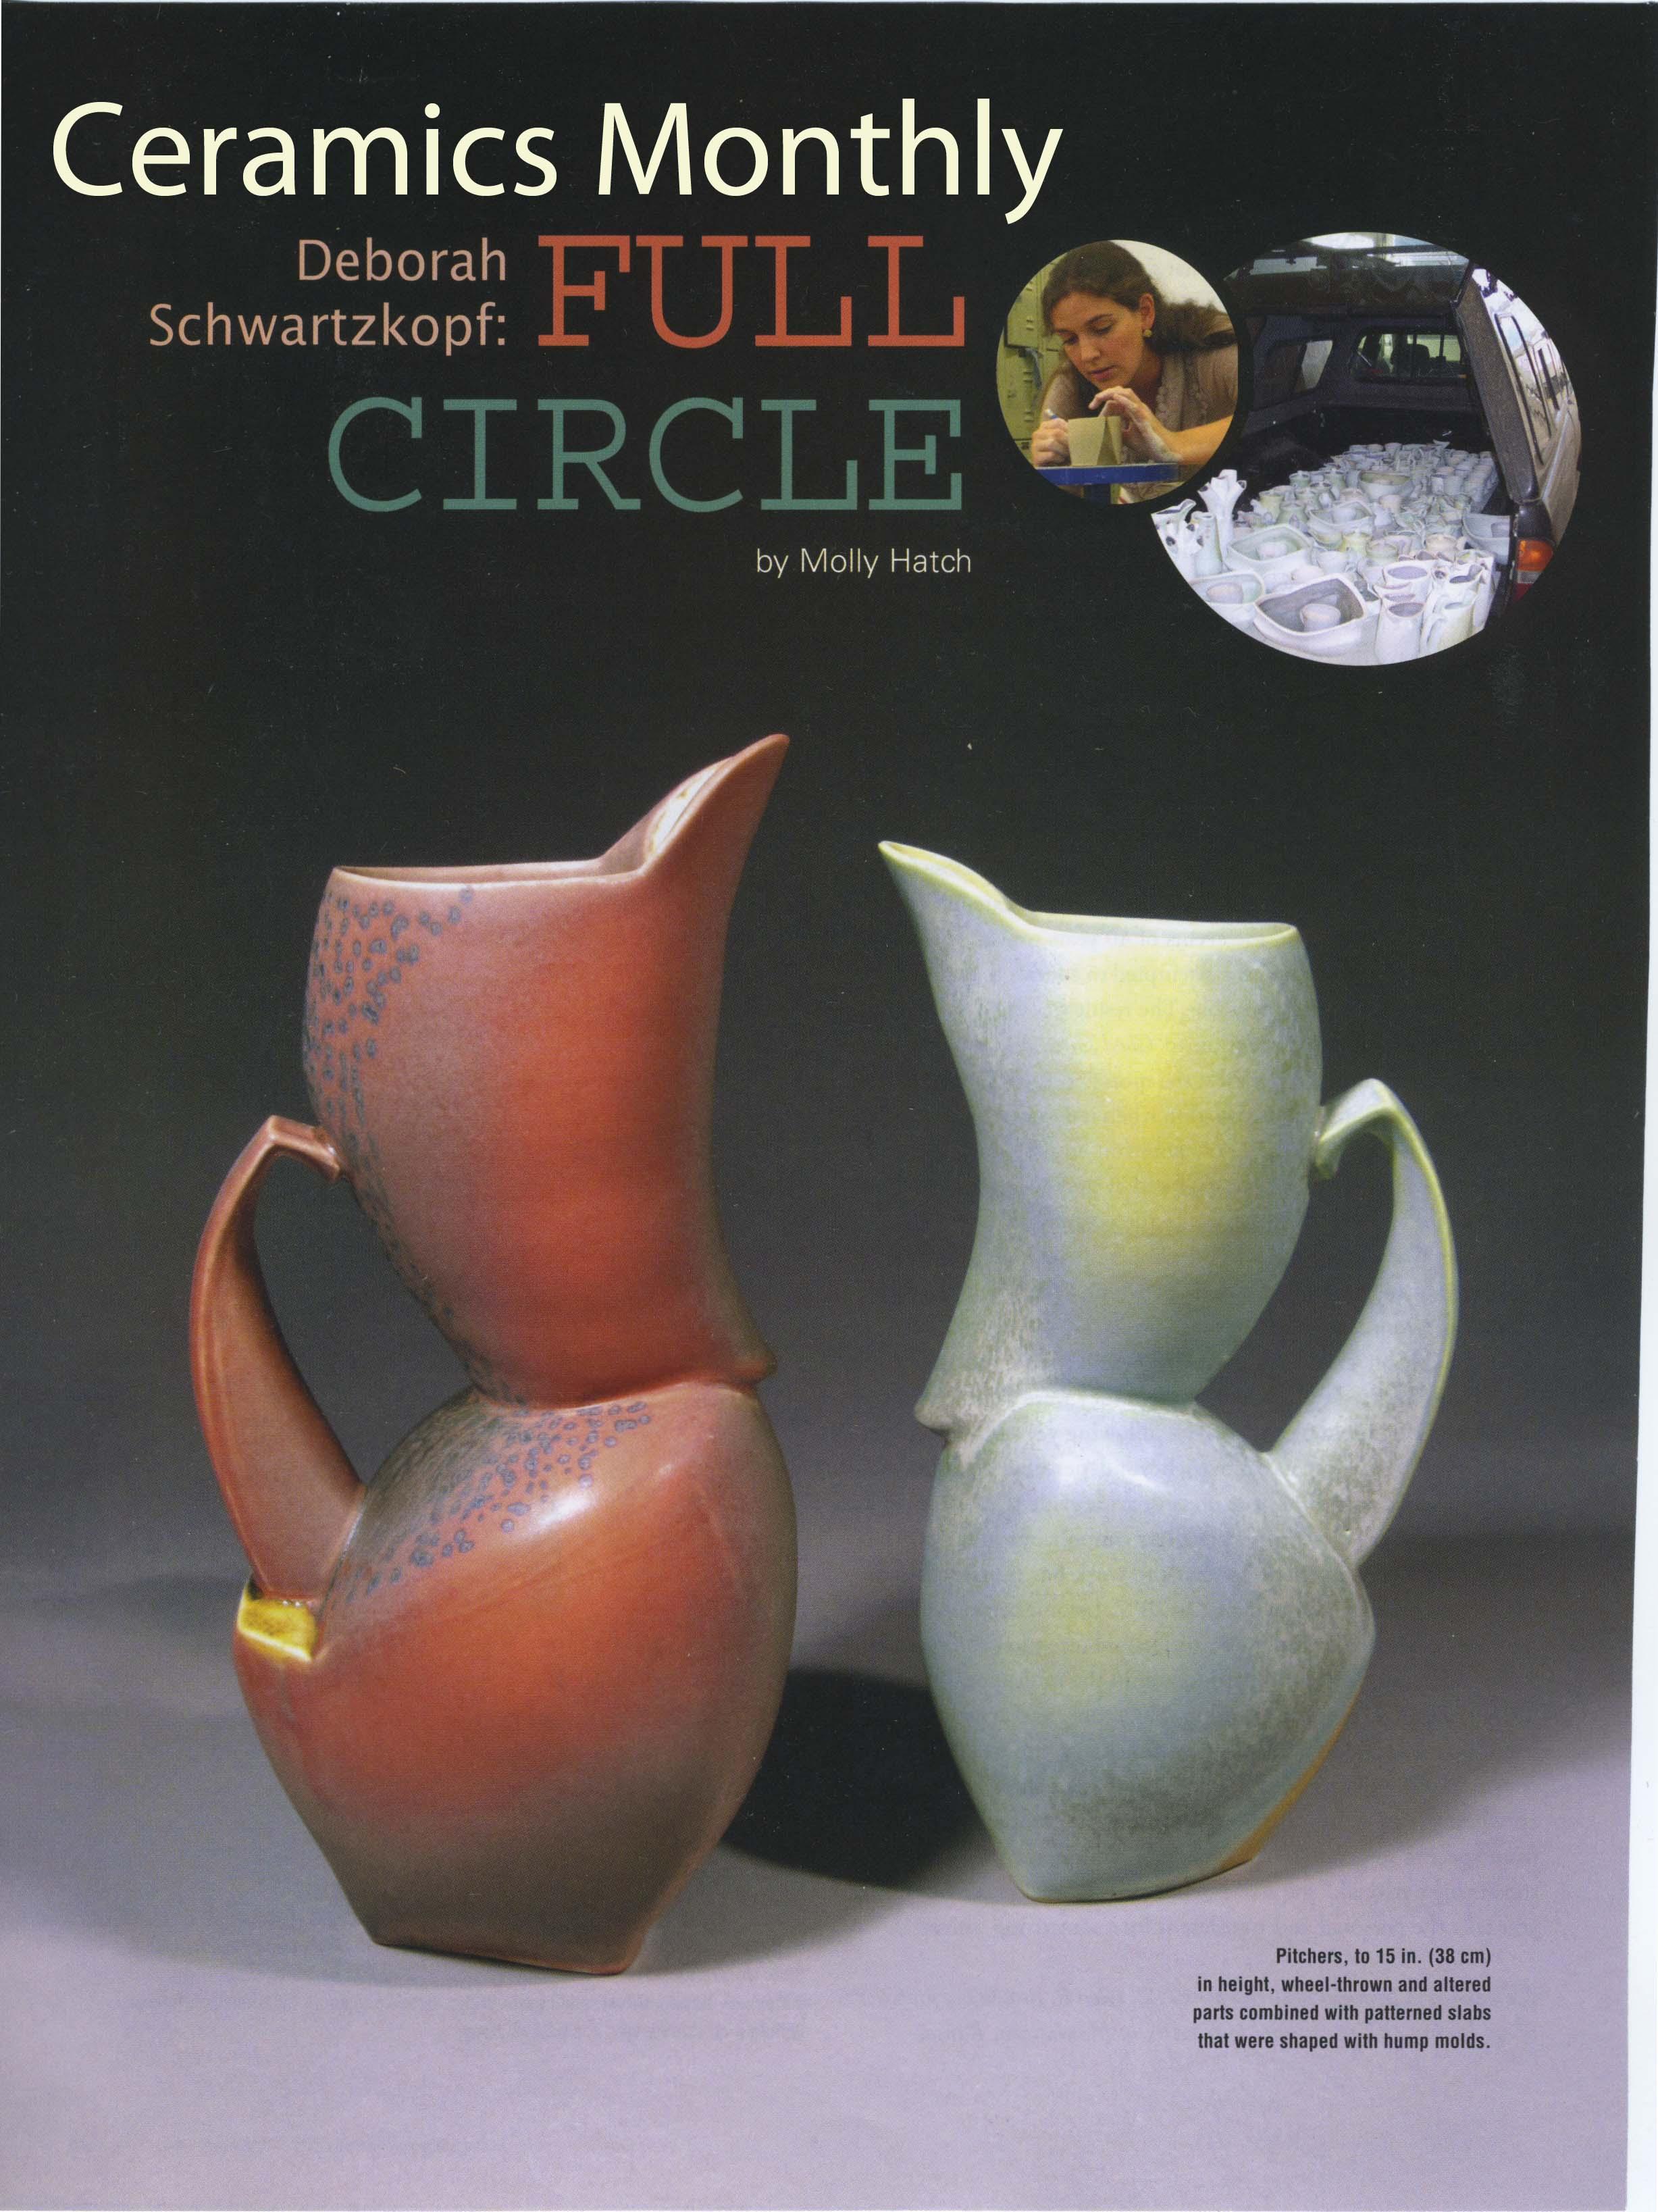 Ceramics Monthly.jpg